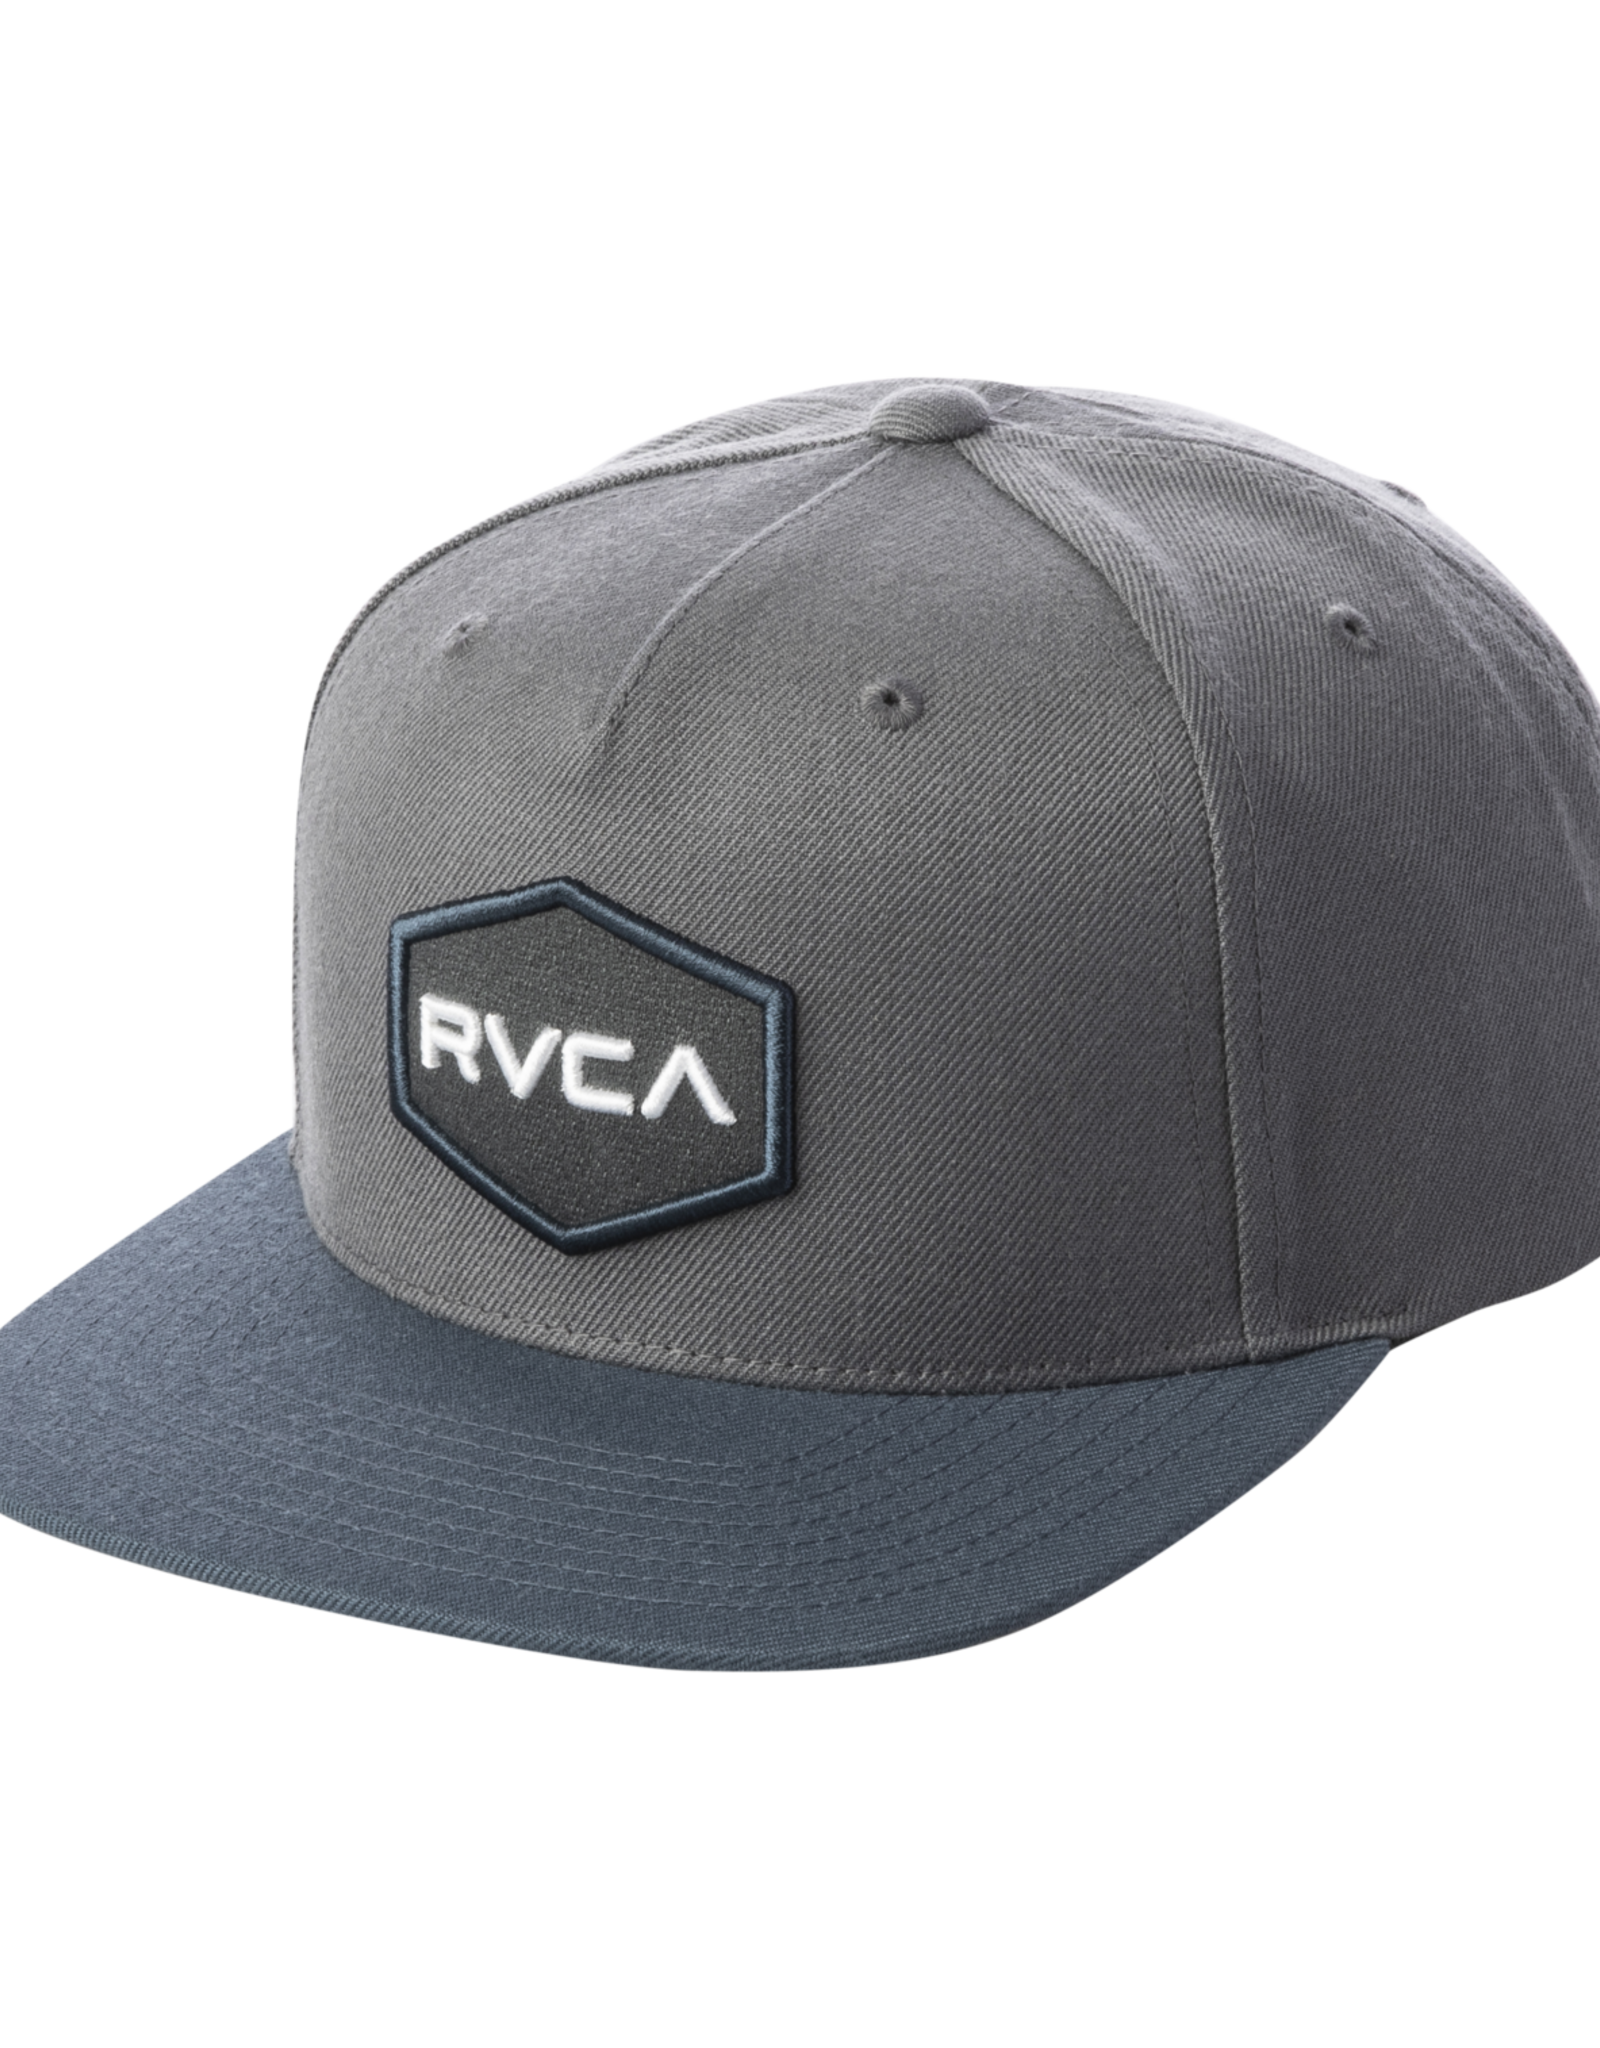 RVCA Commonwealth Snapback GBL